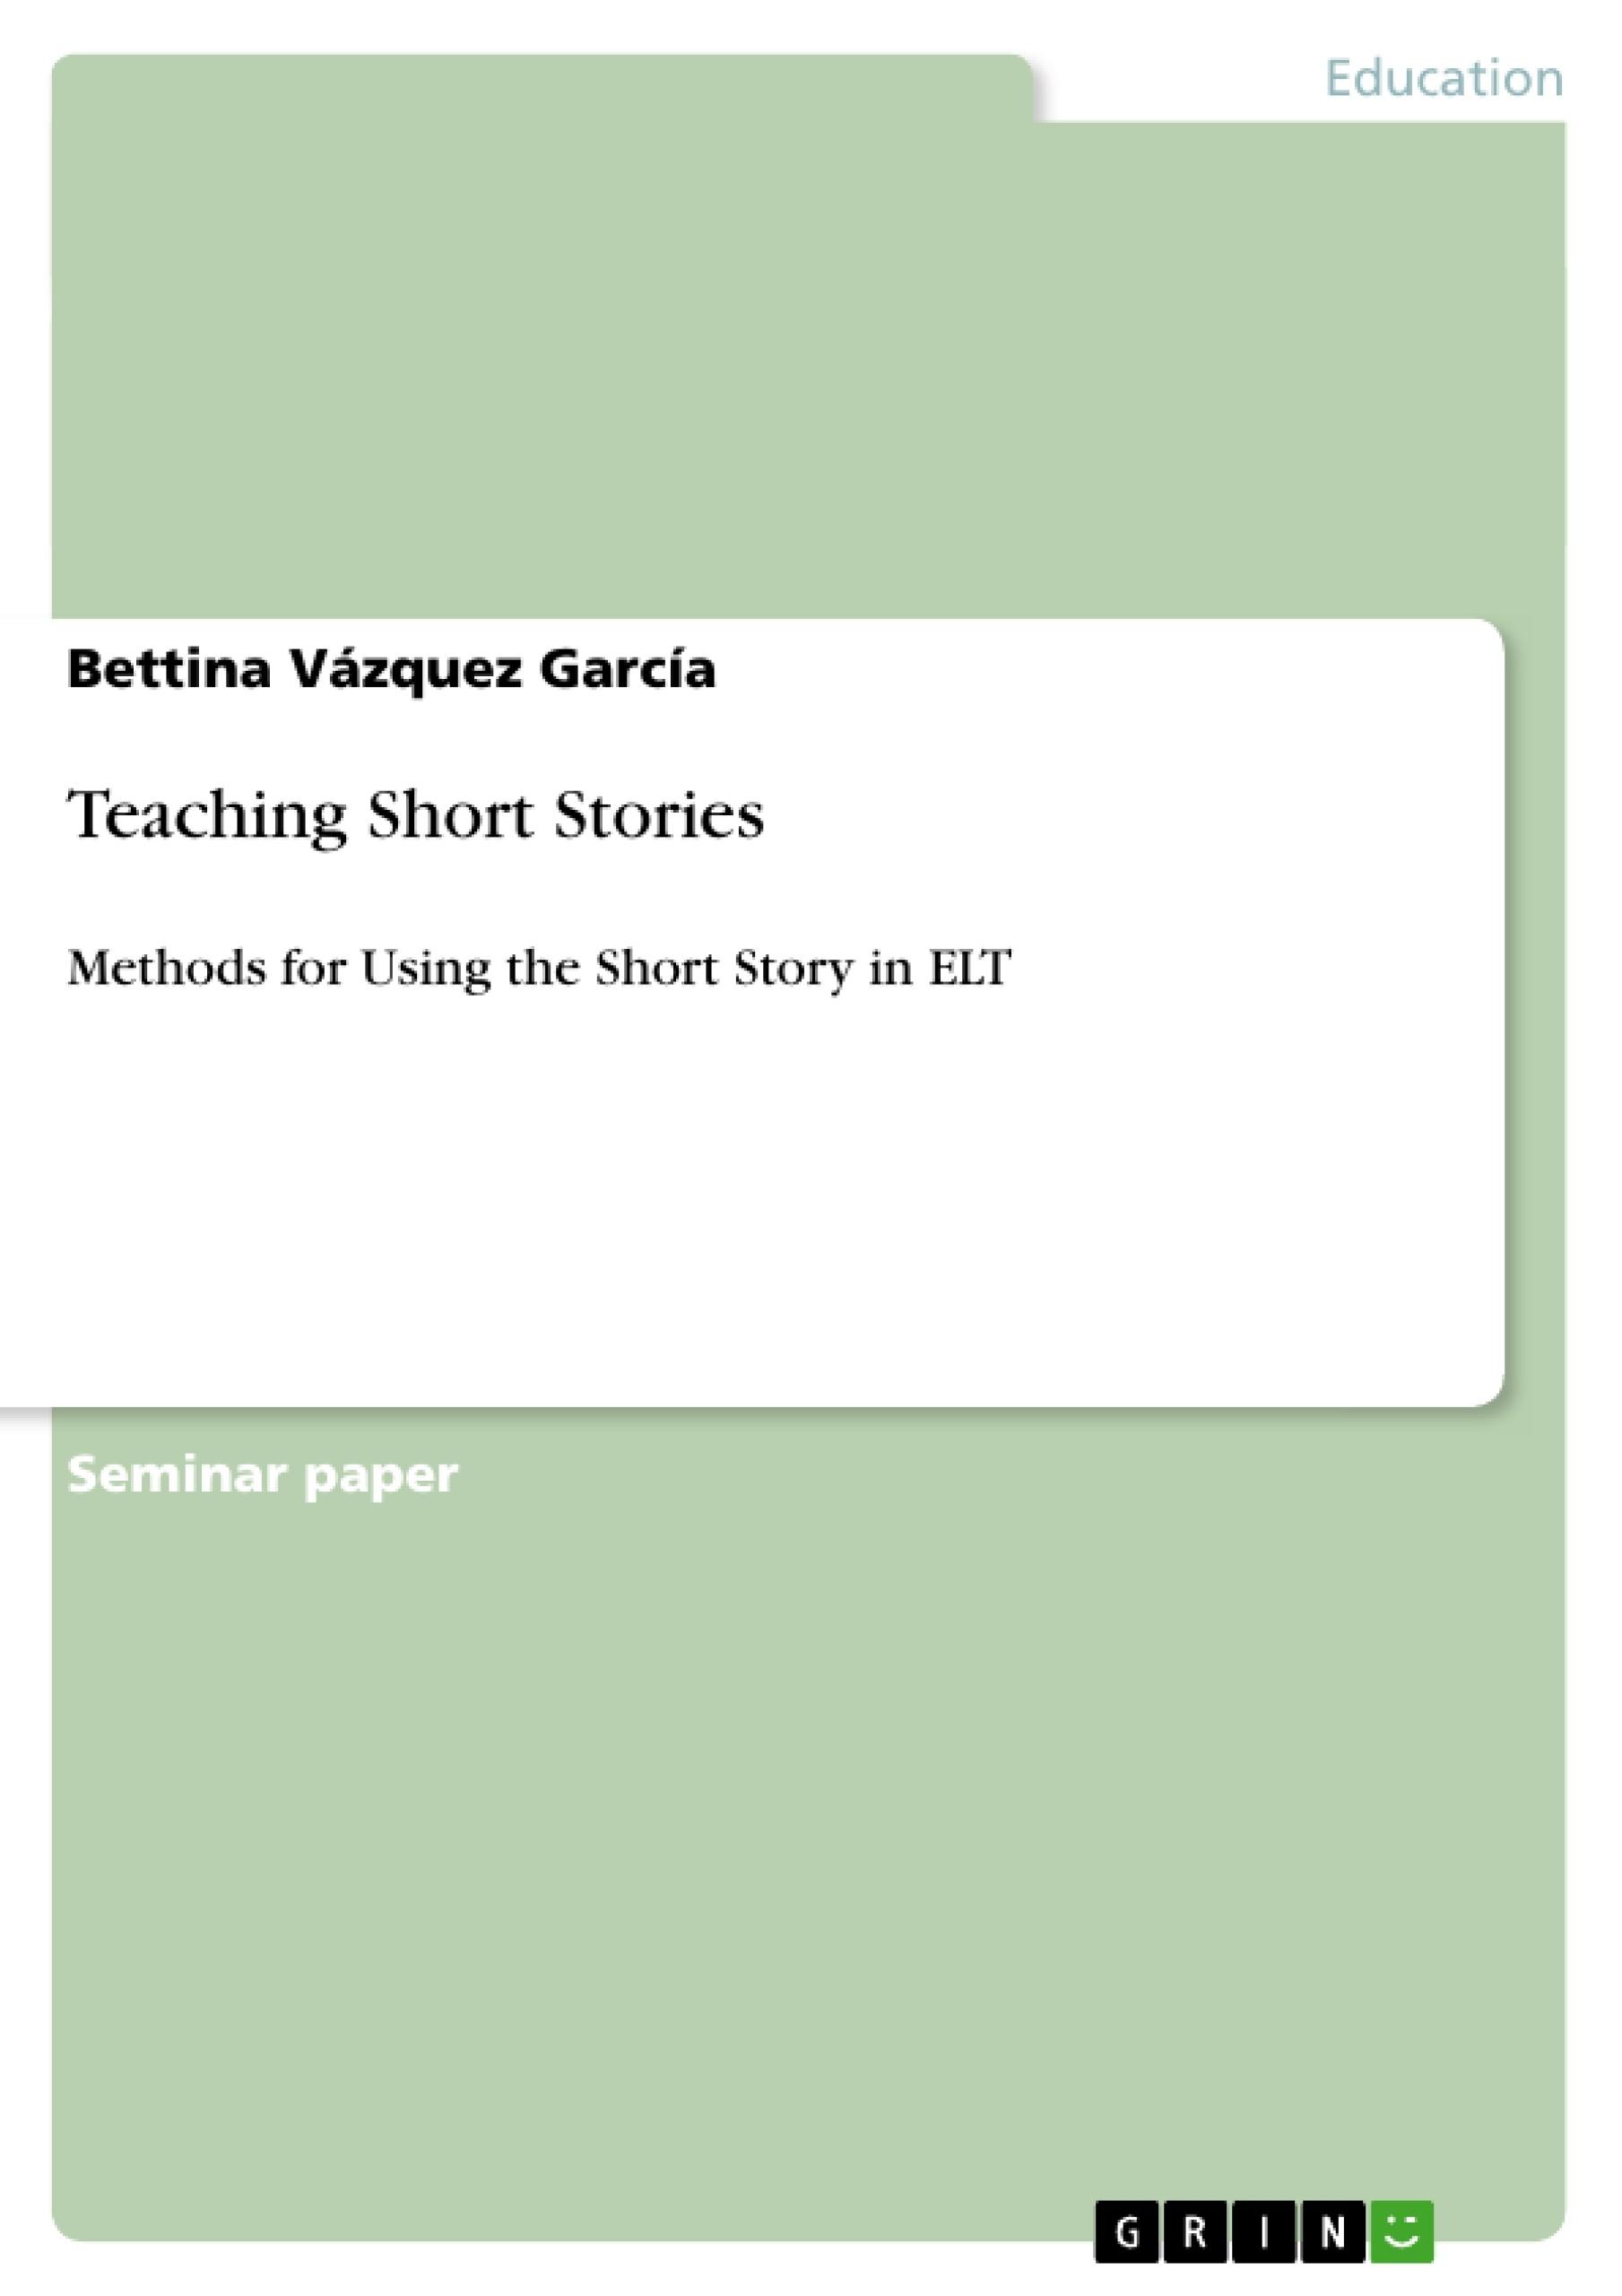 Title: Teaching Short Stories